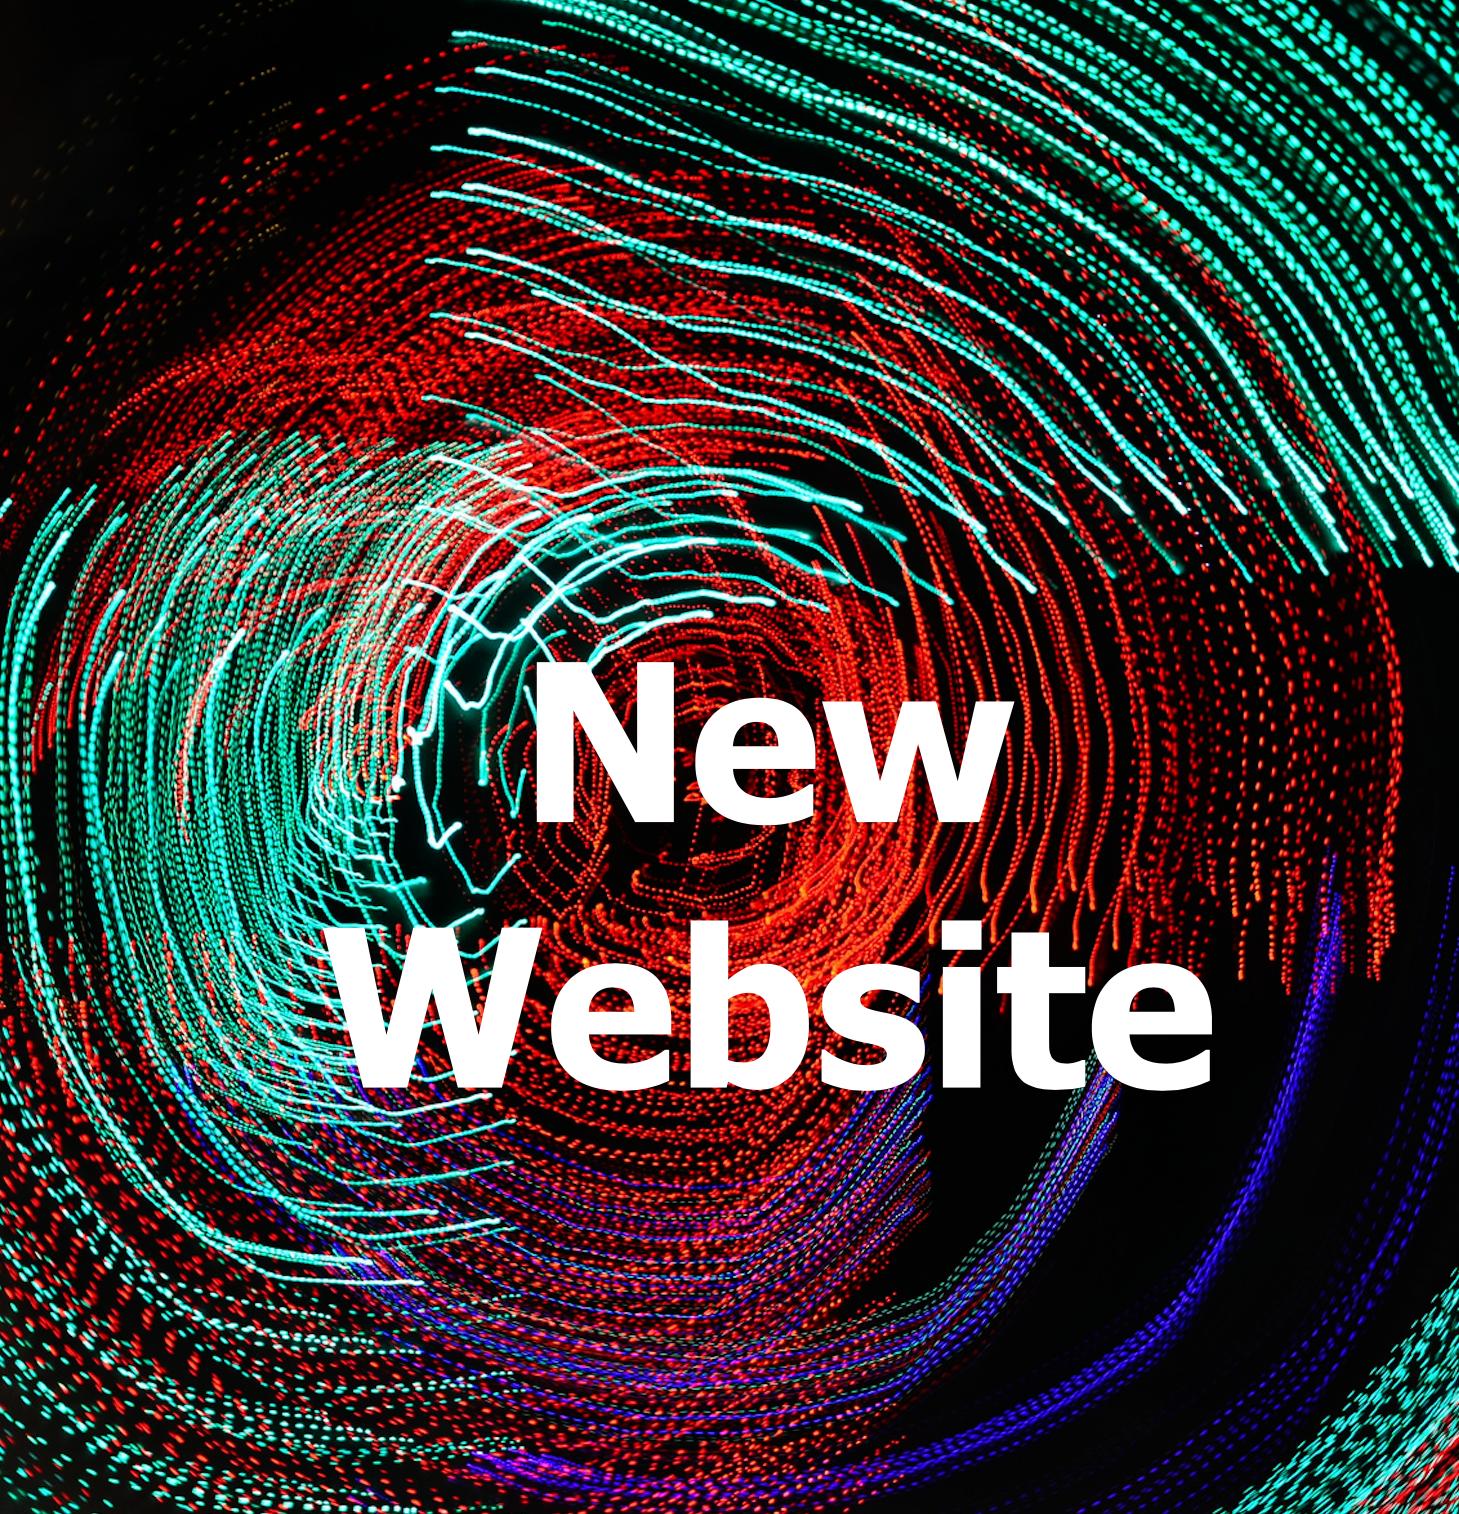 New website coming in Sept